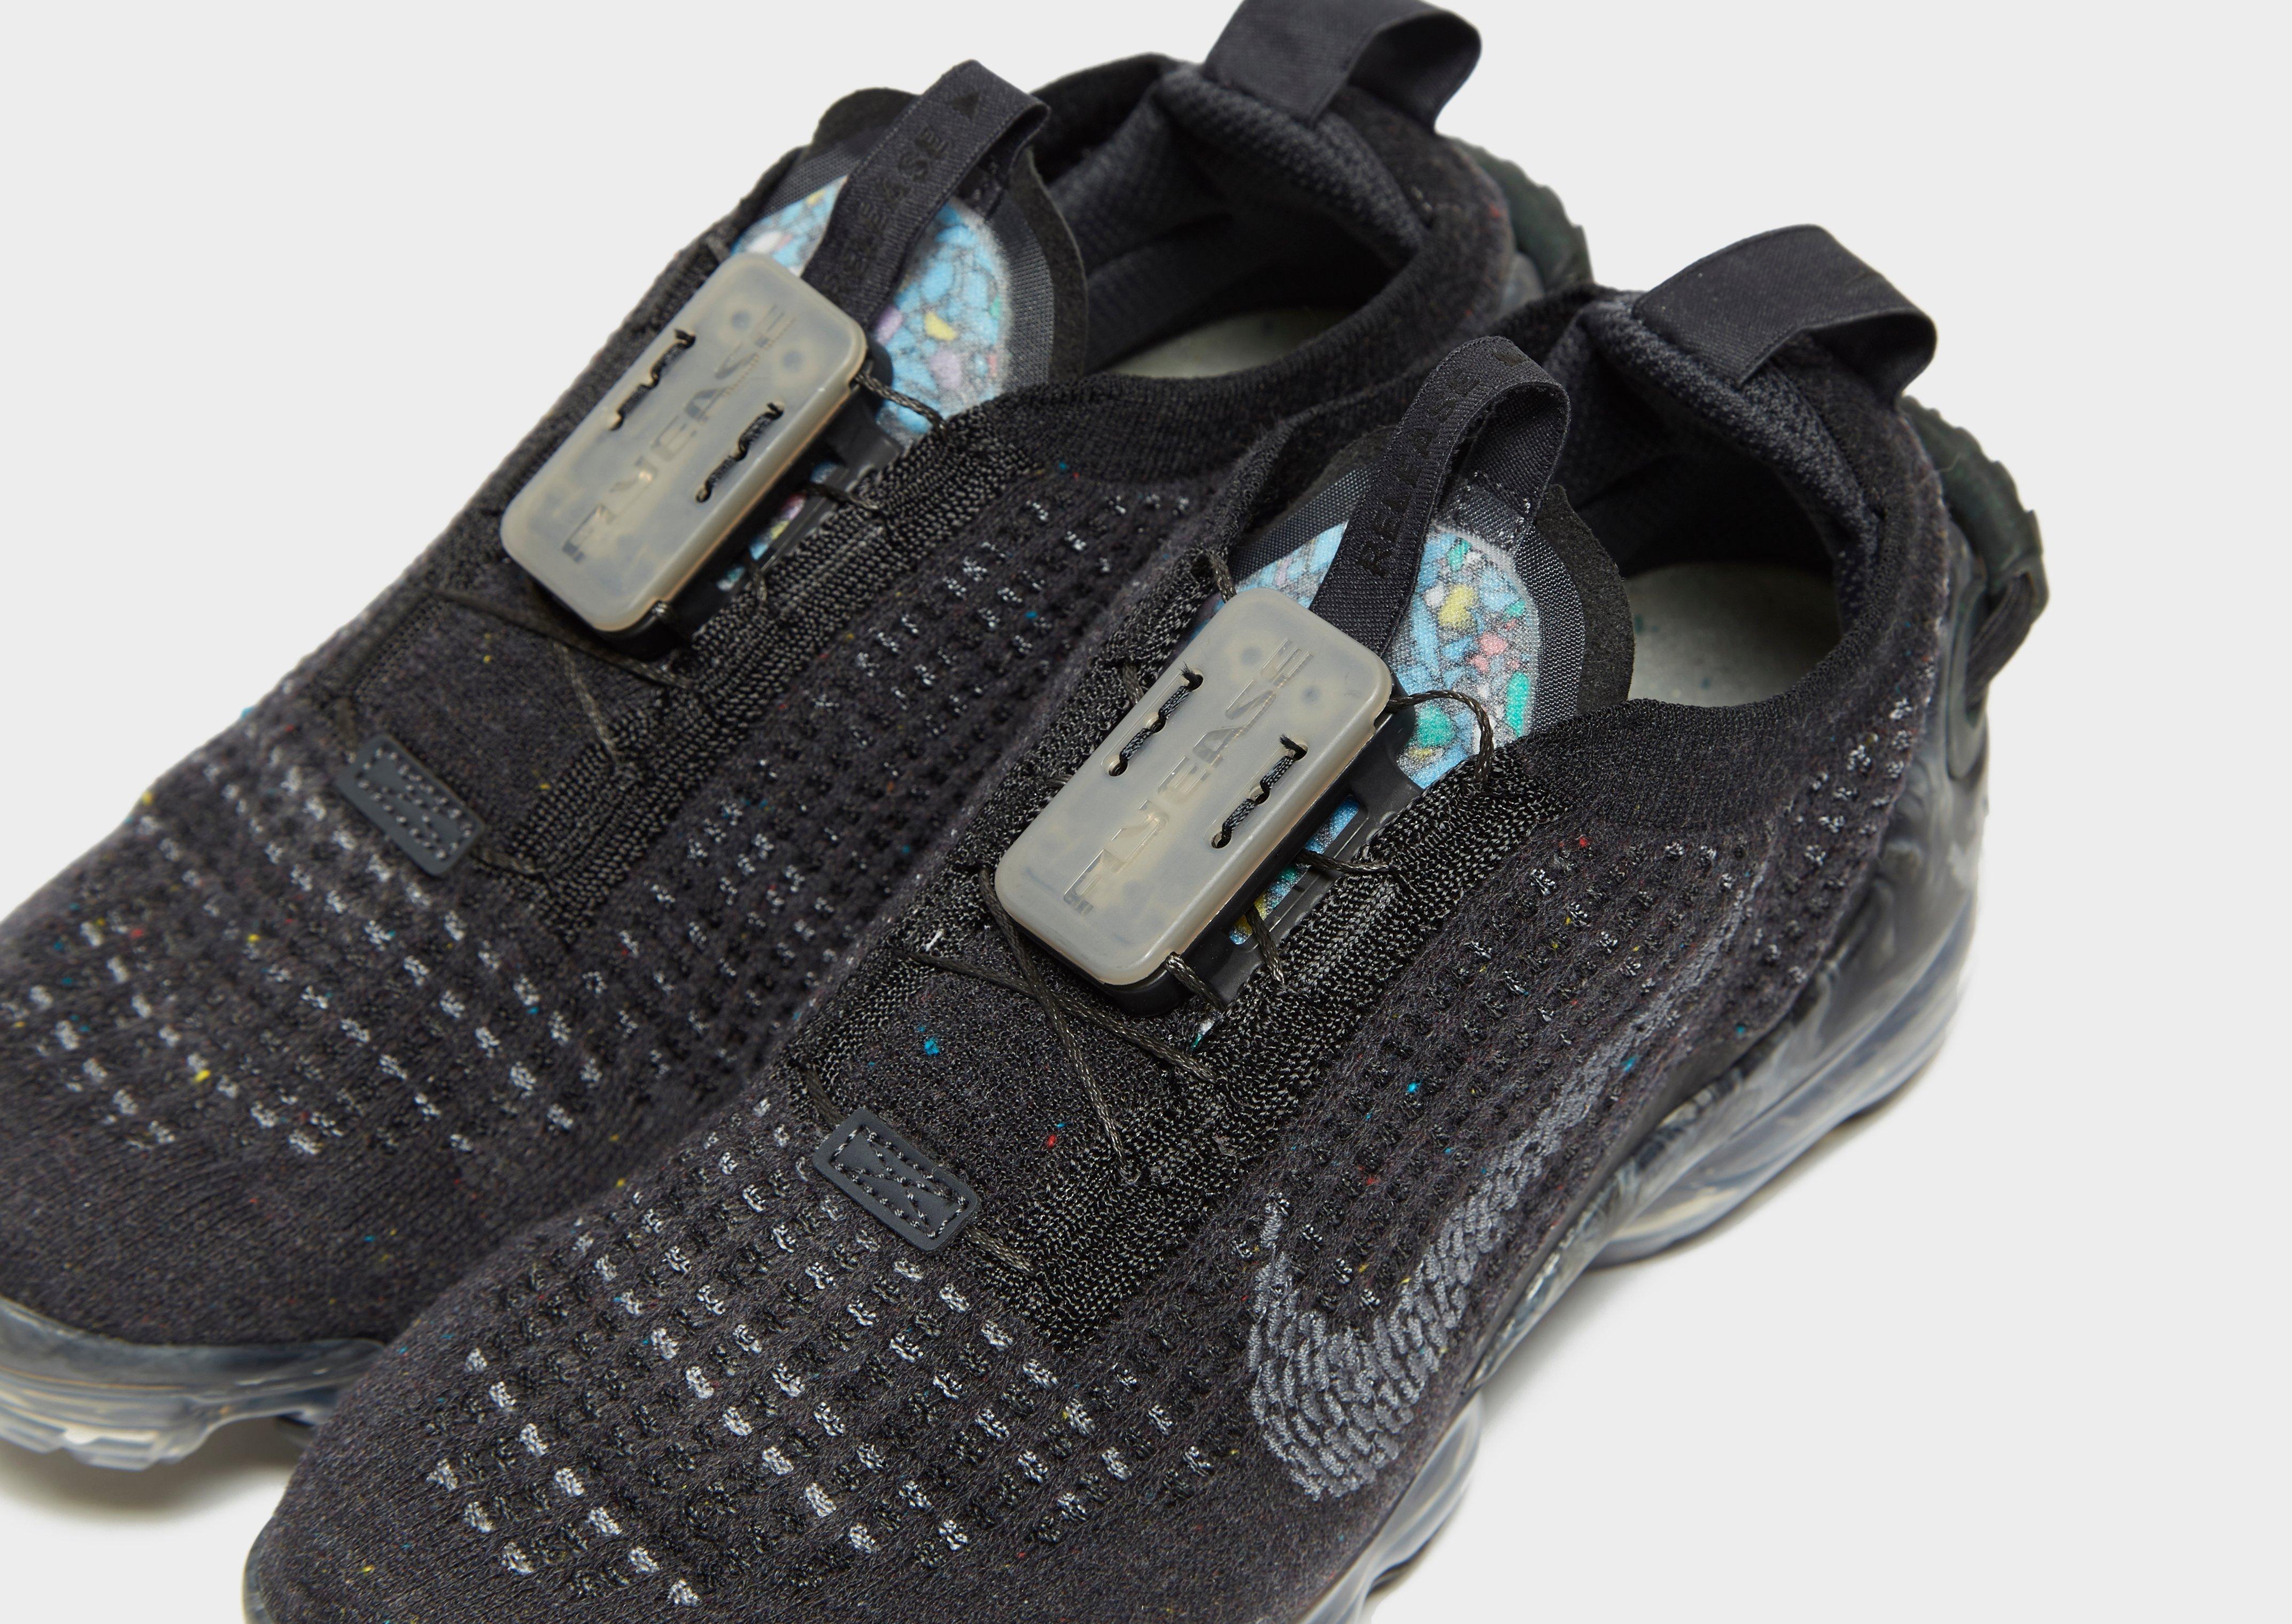 The Nike Vapormax 2020 Set To Debut At Tokyo Olympics